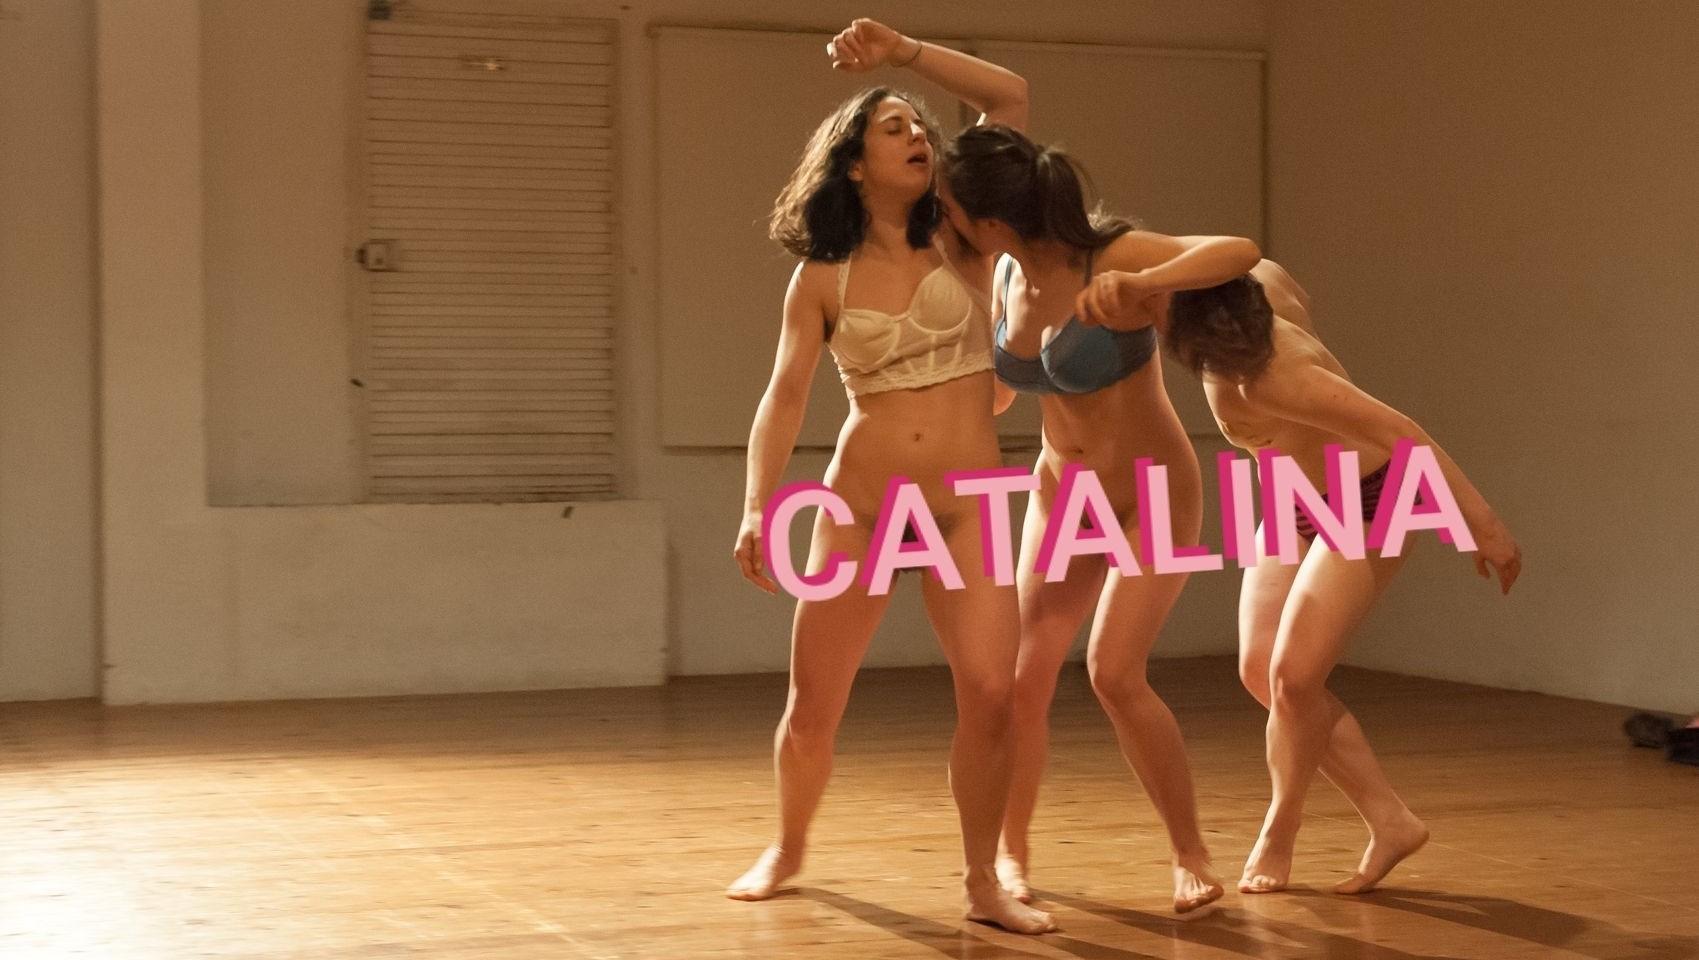 Catalina +18 - Iniciativa Sexual Femenina